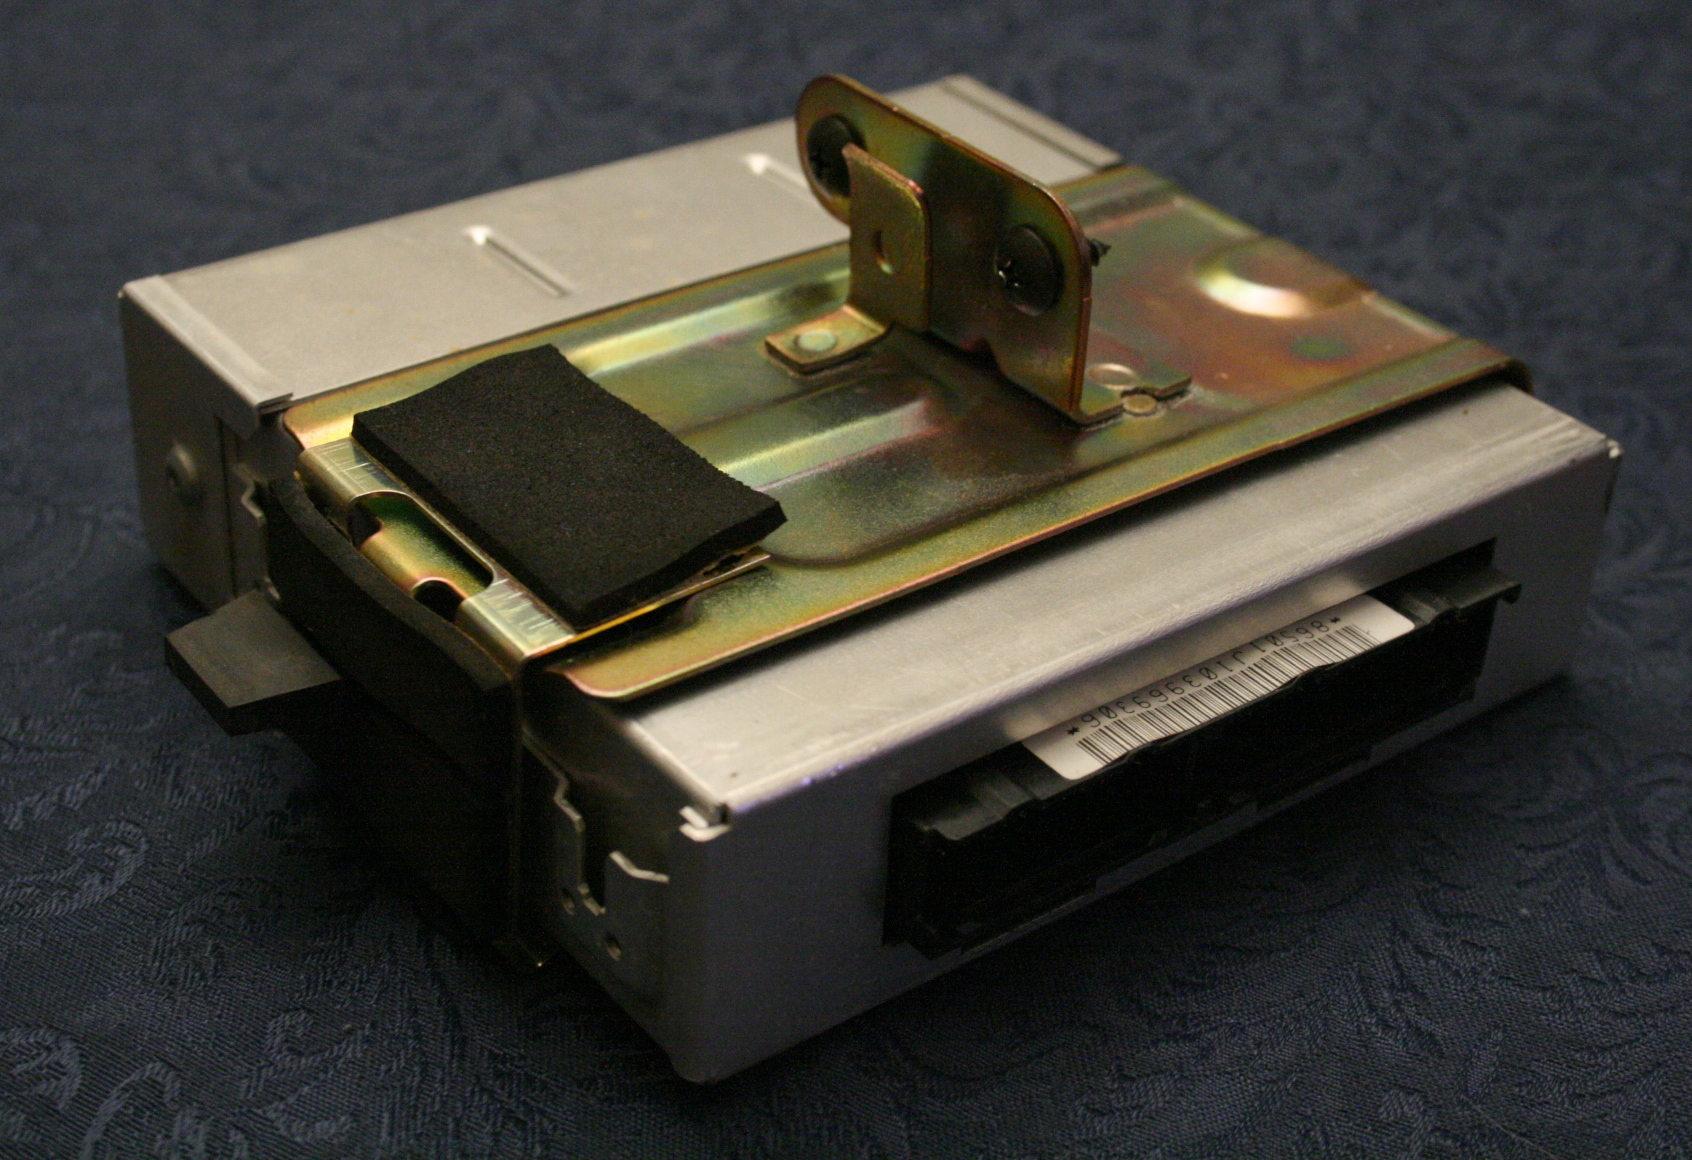 Electronic control unit - Wikipedia